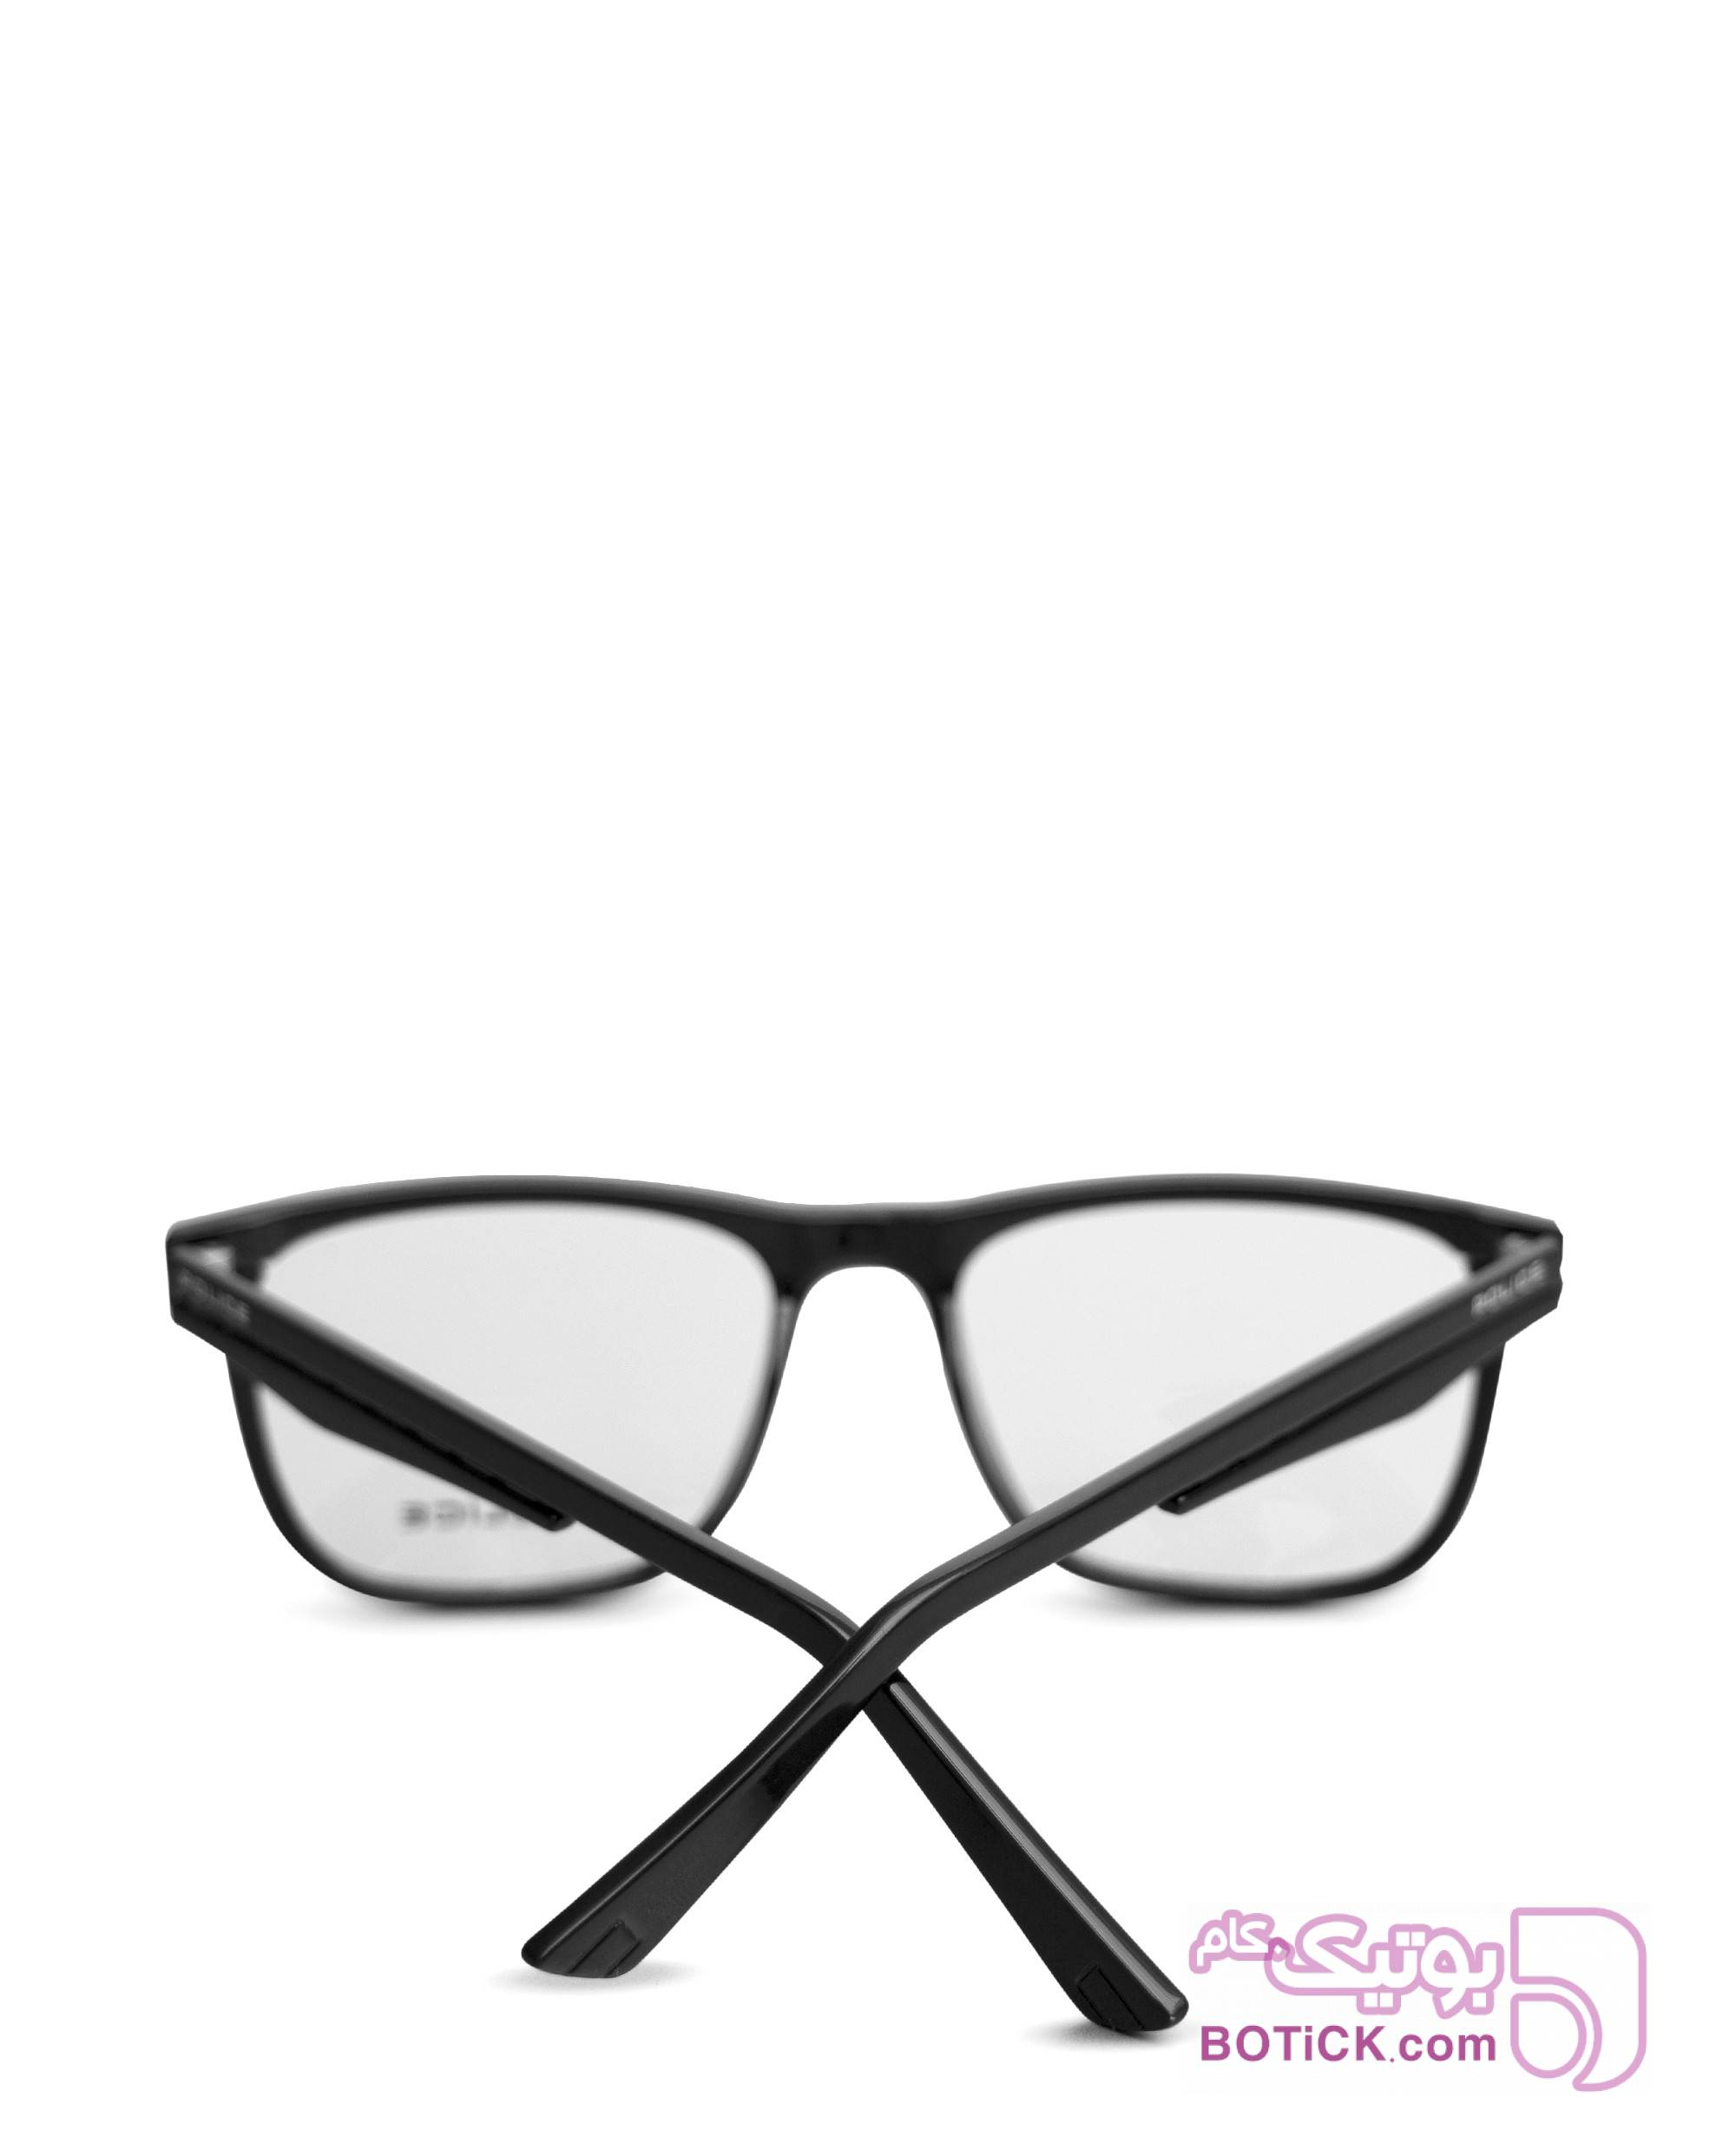 فریم عینک طبی Police کد 0637 مشکی عینک طبی